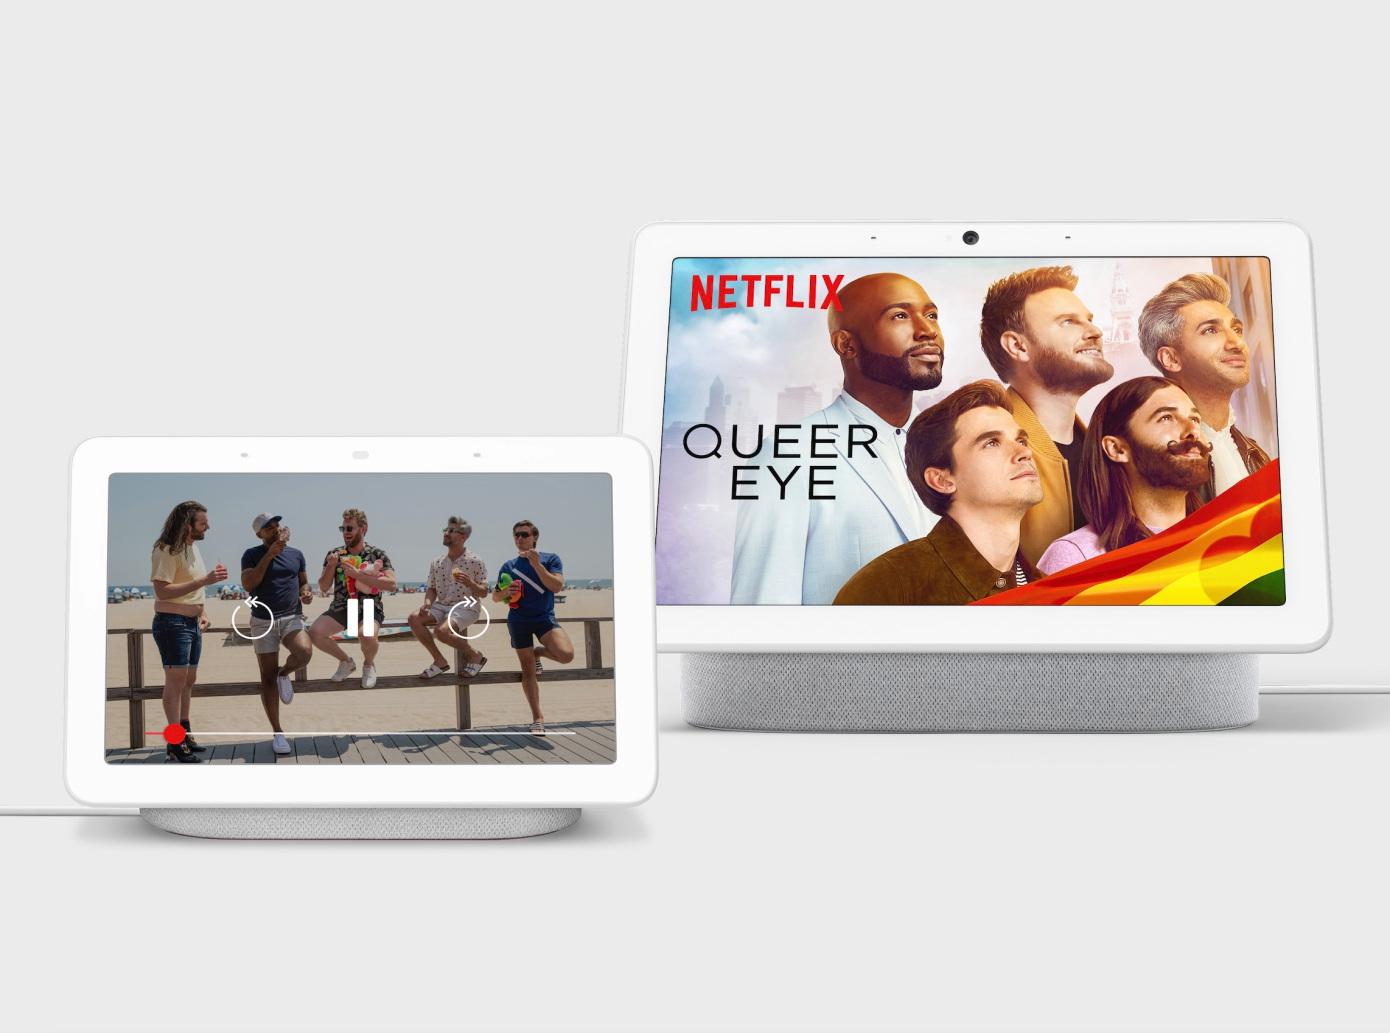 Netflix se expande hacia las pantallas inteligentes Nest de Google